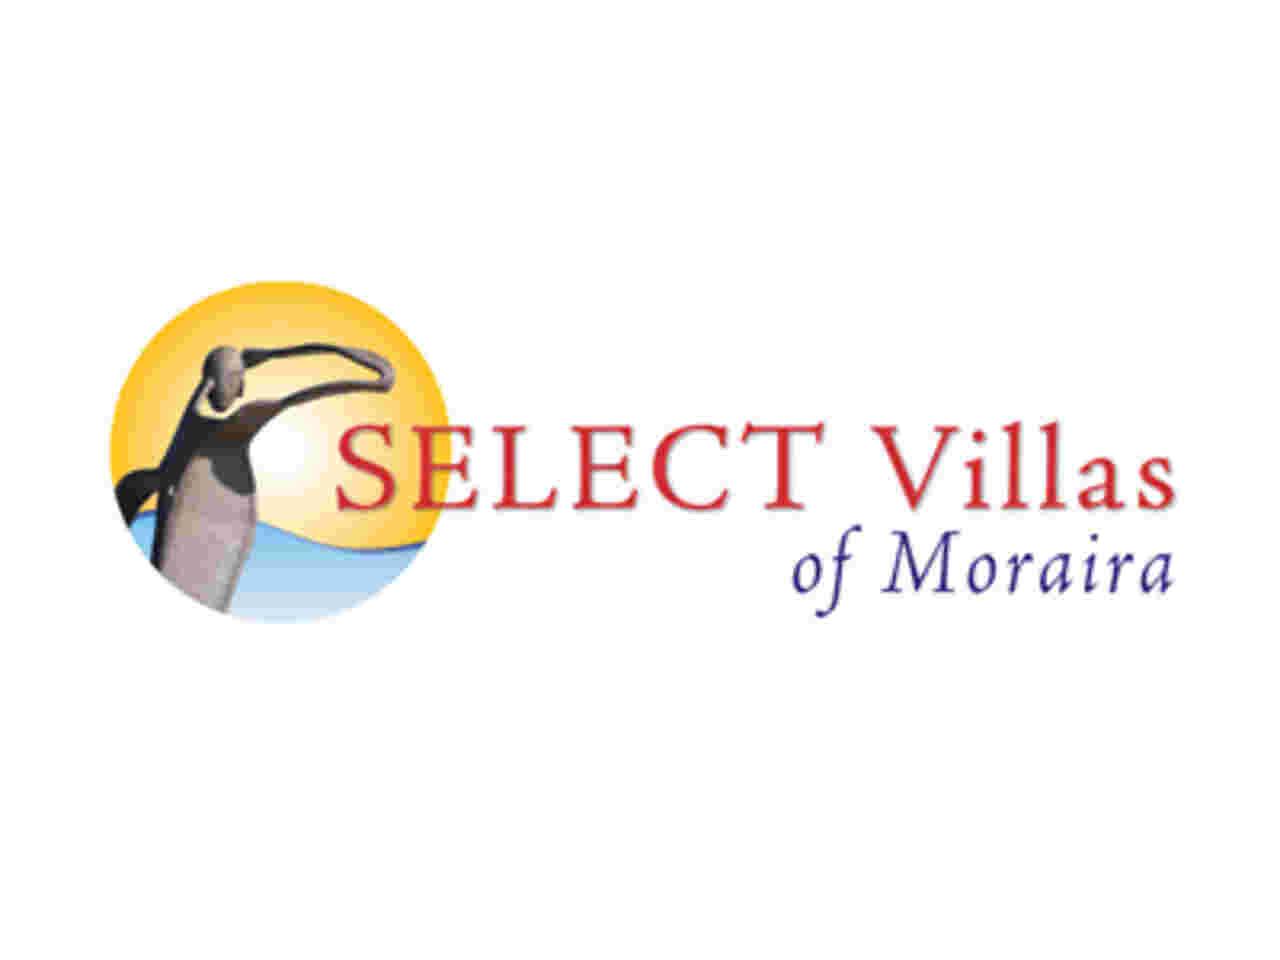 Select Villas of Moraira